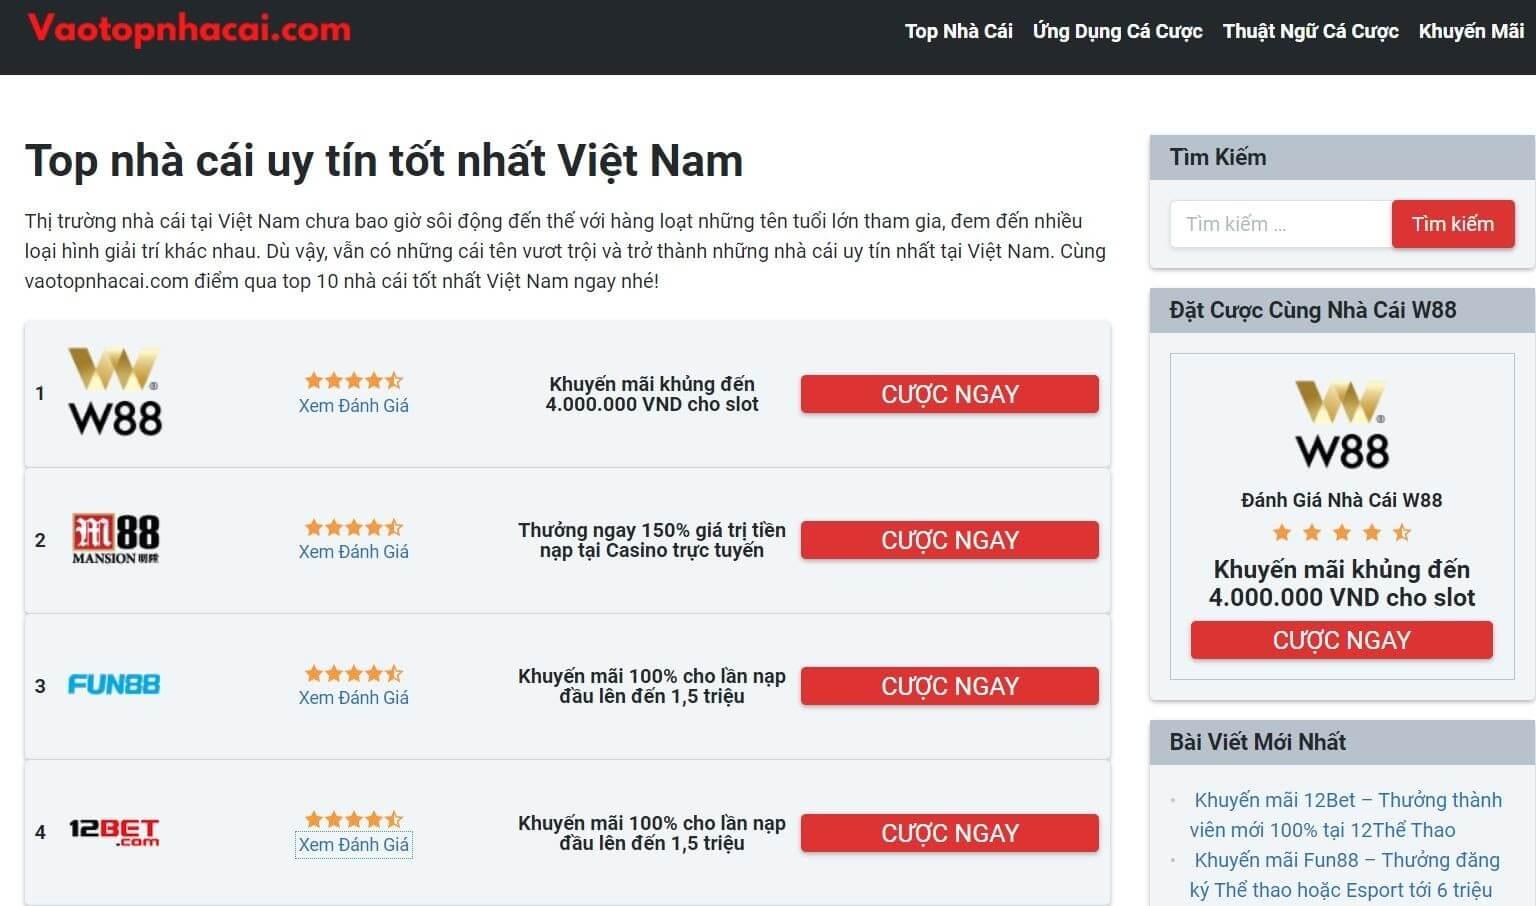 Khám phá website vaotopnhacai.com